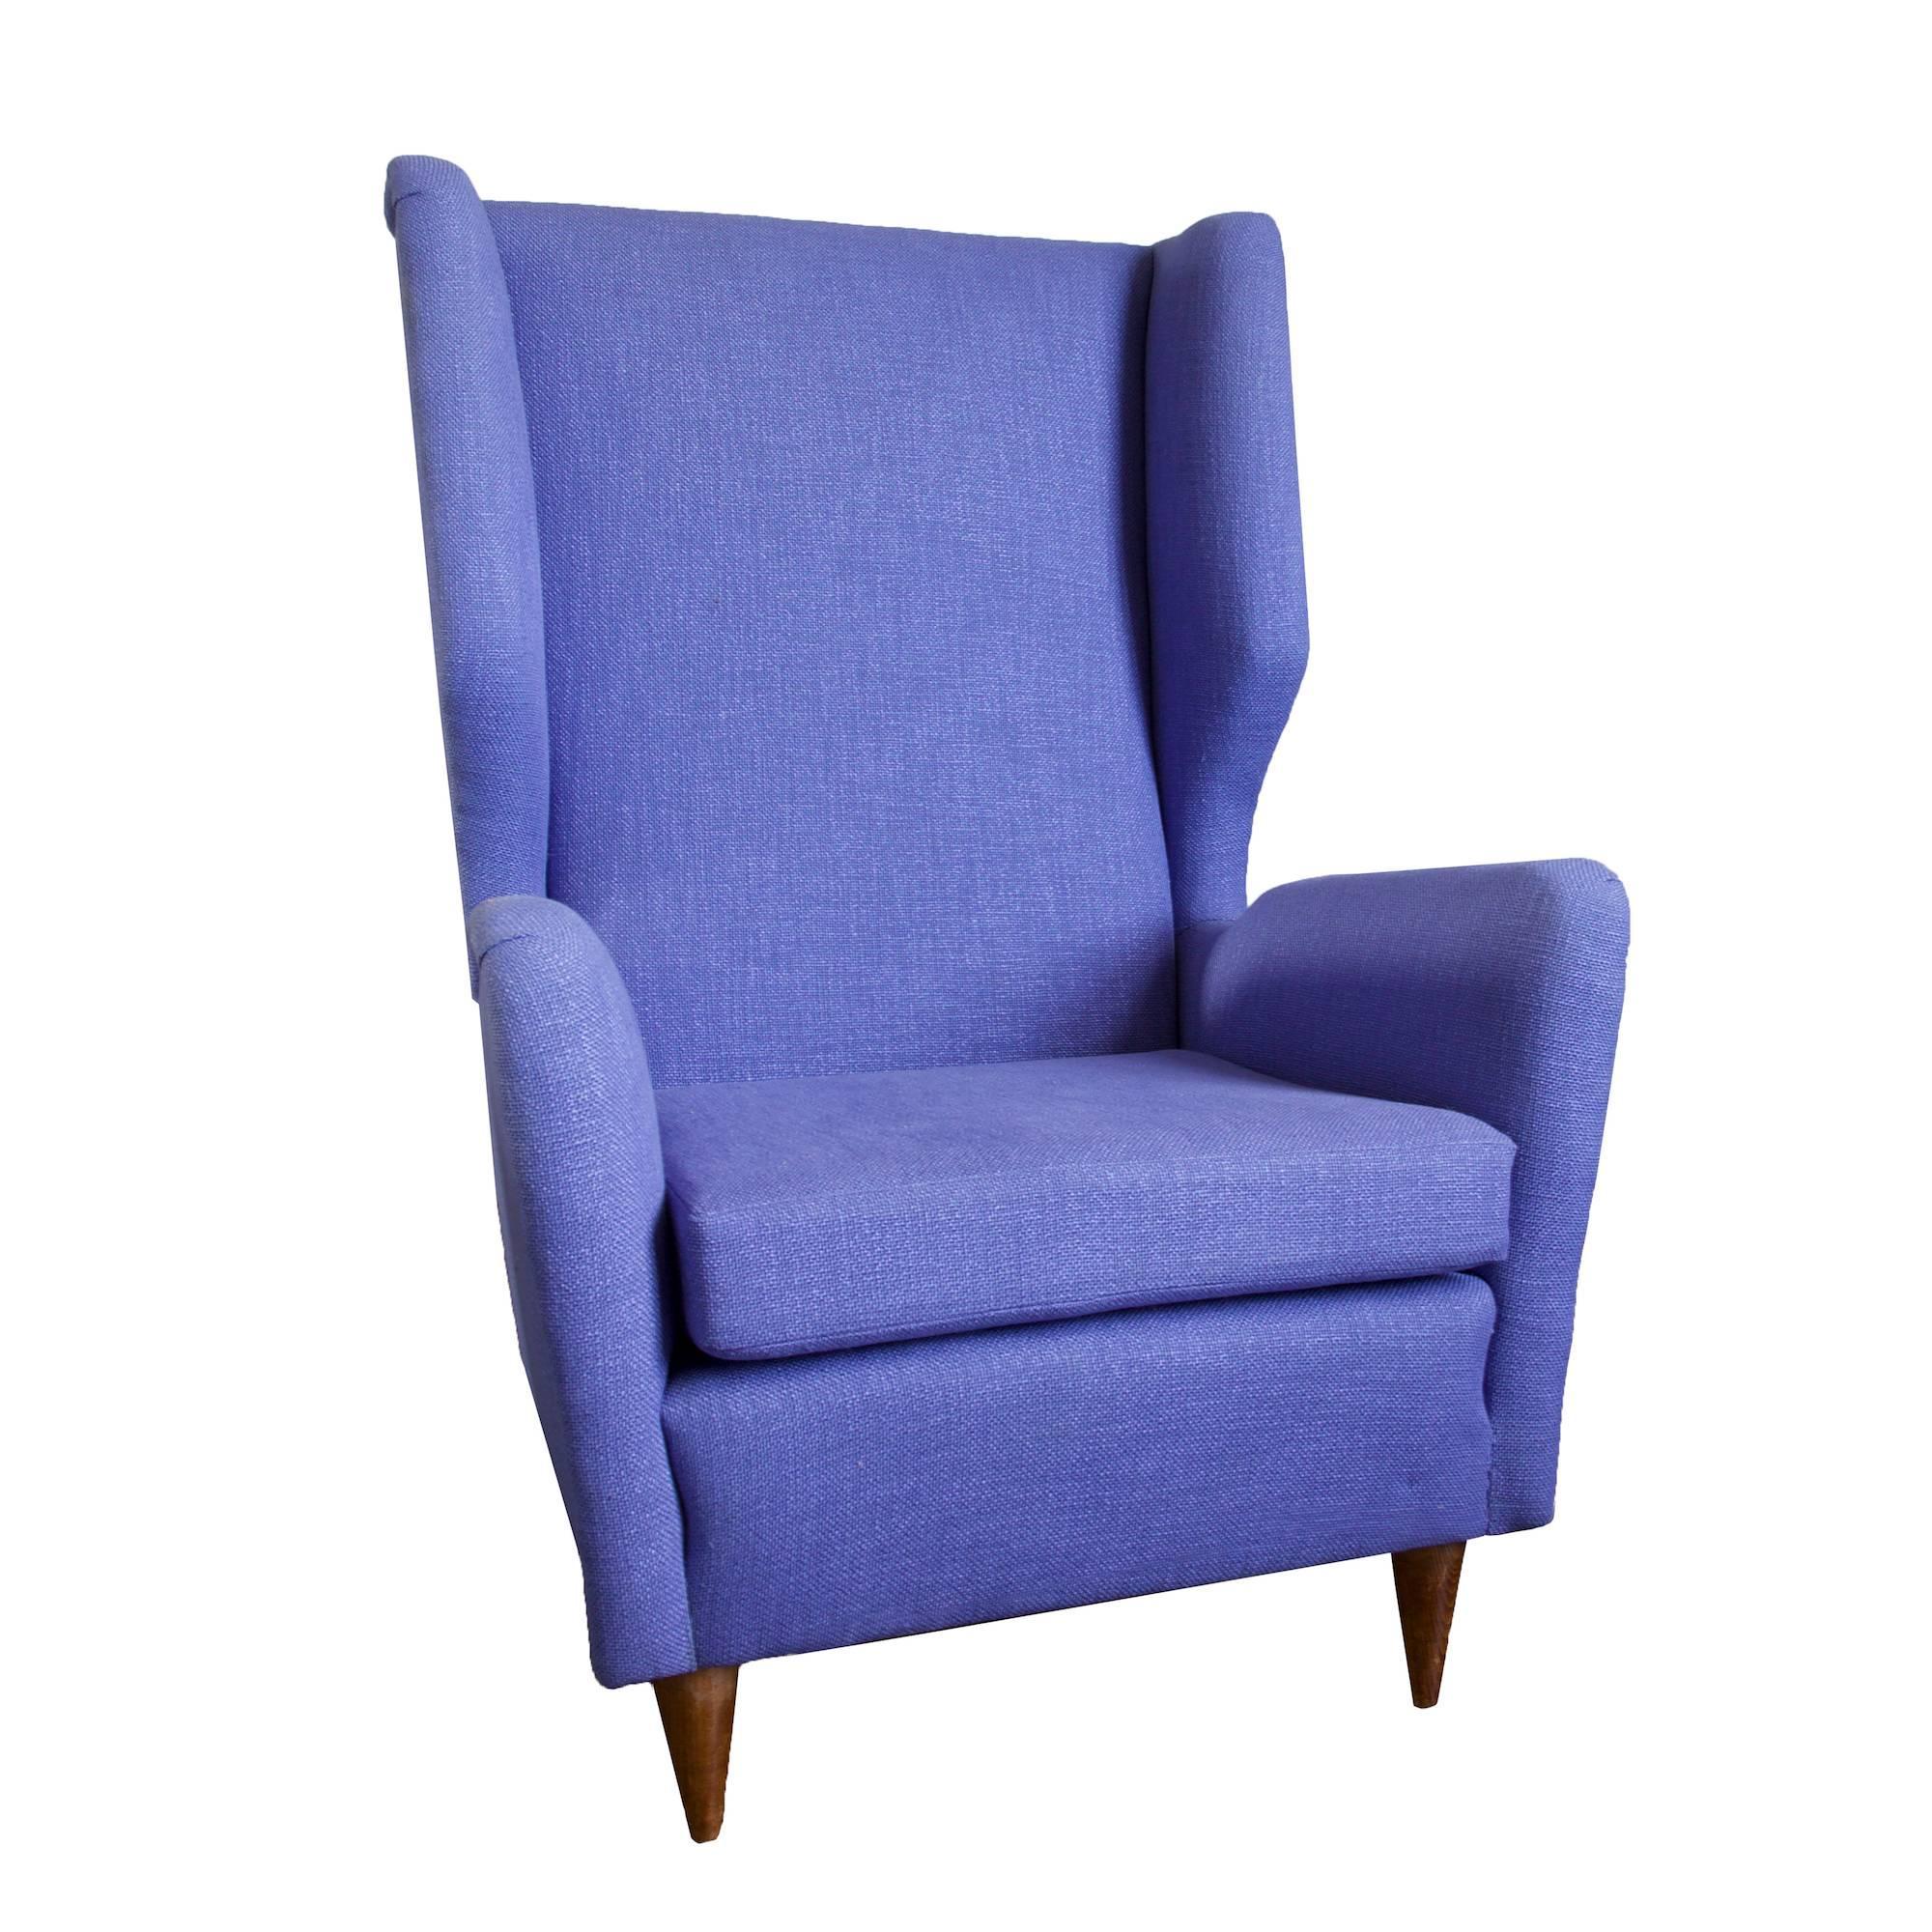 Gio Ponti Furniture 401 For Sale At 1stdibs